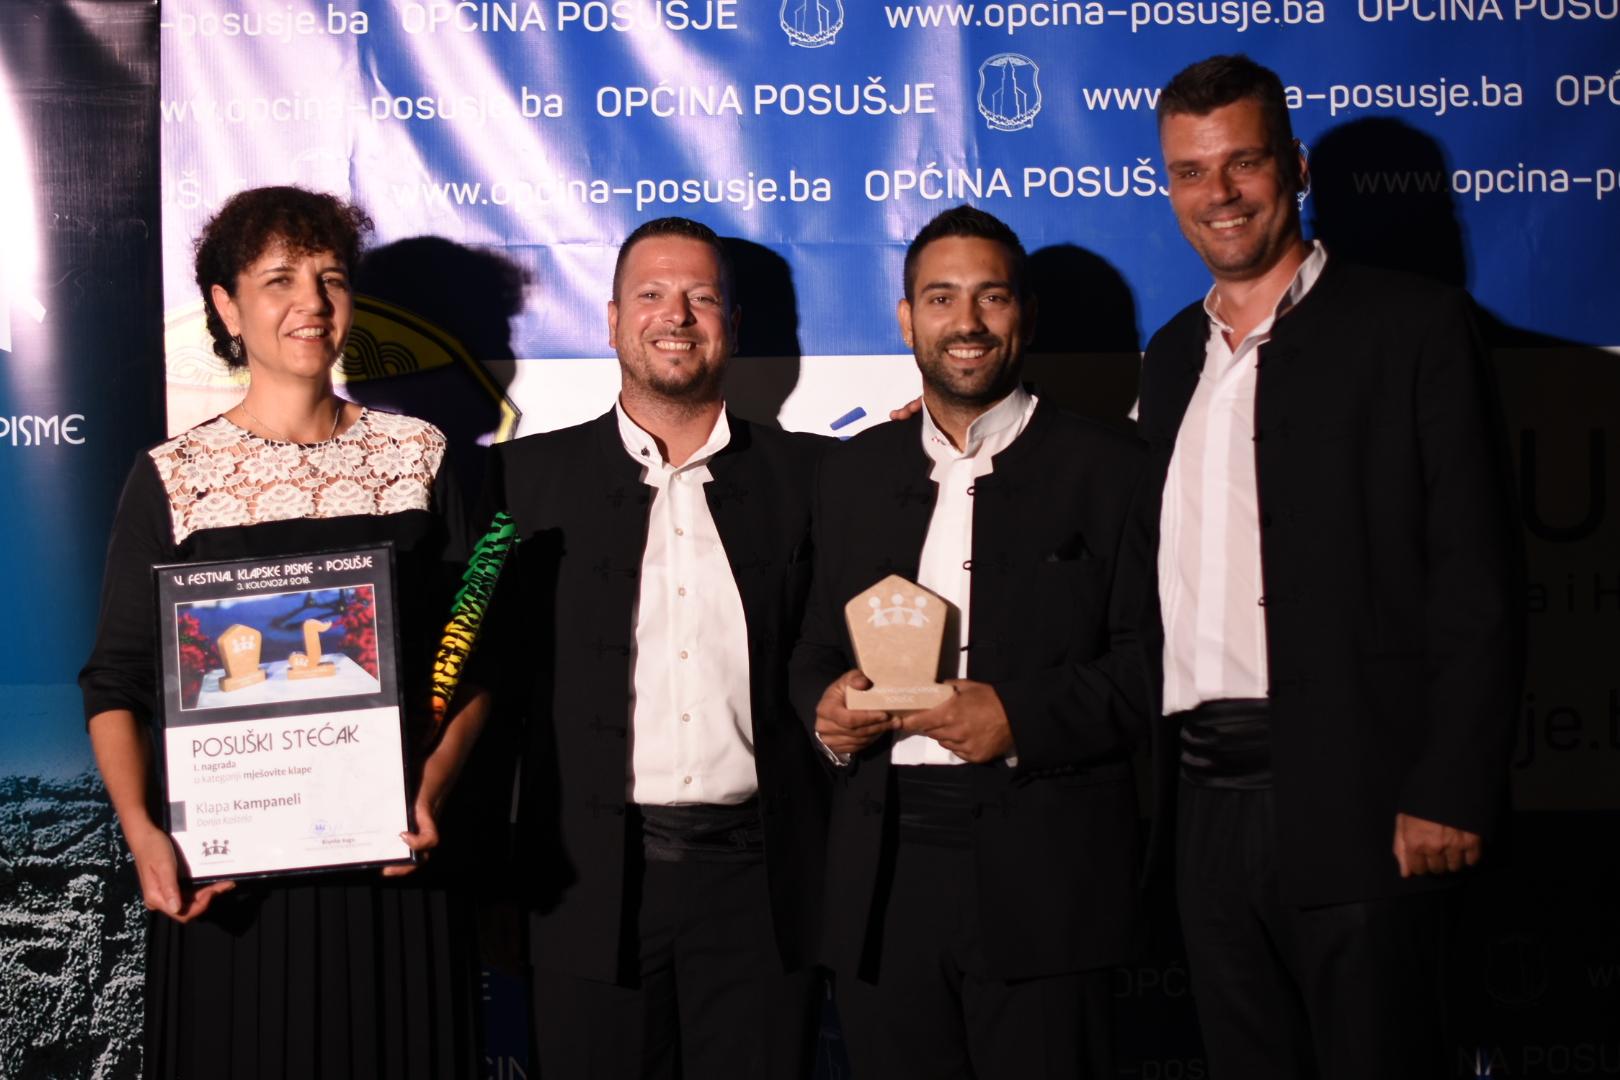 Kampanel prva nagrada žirija, Pašareta prva nagrada publike Objavljeno: 03. kolovoza 2018.